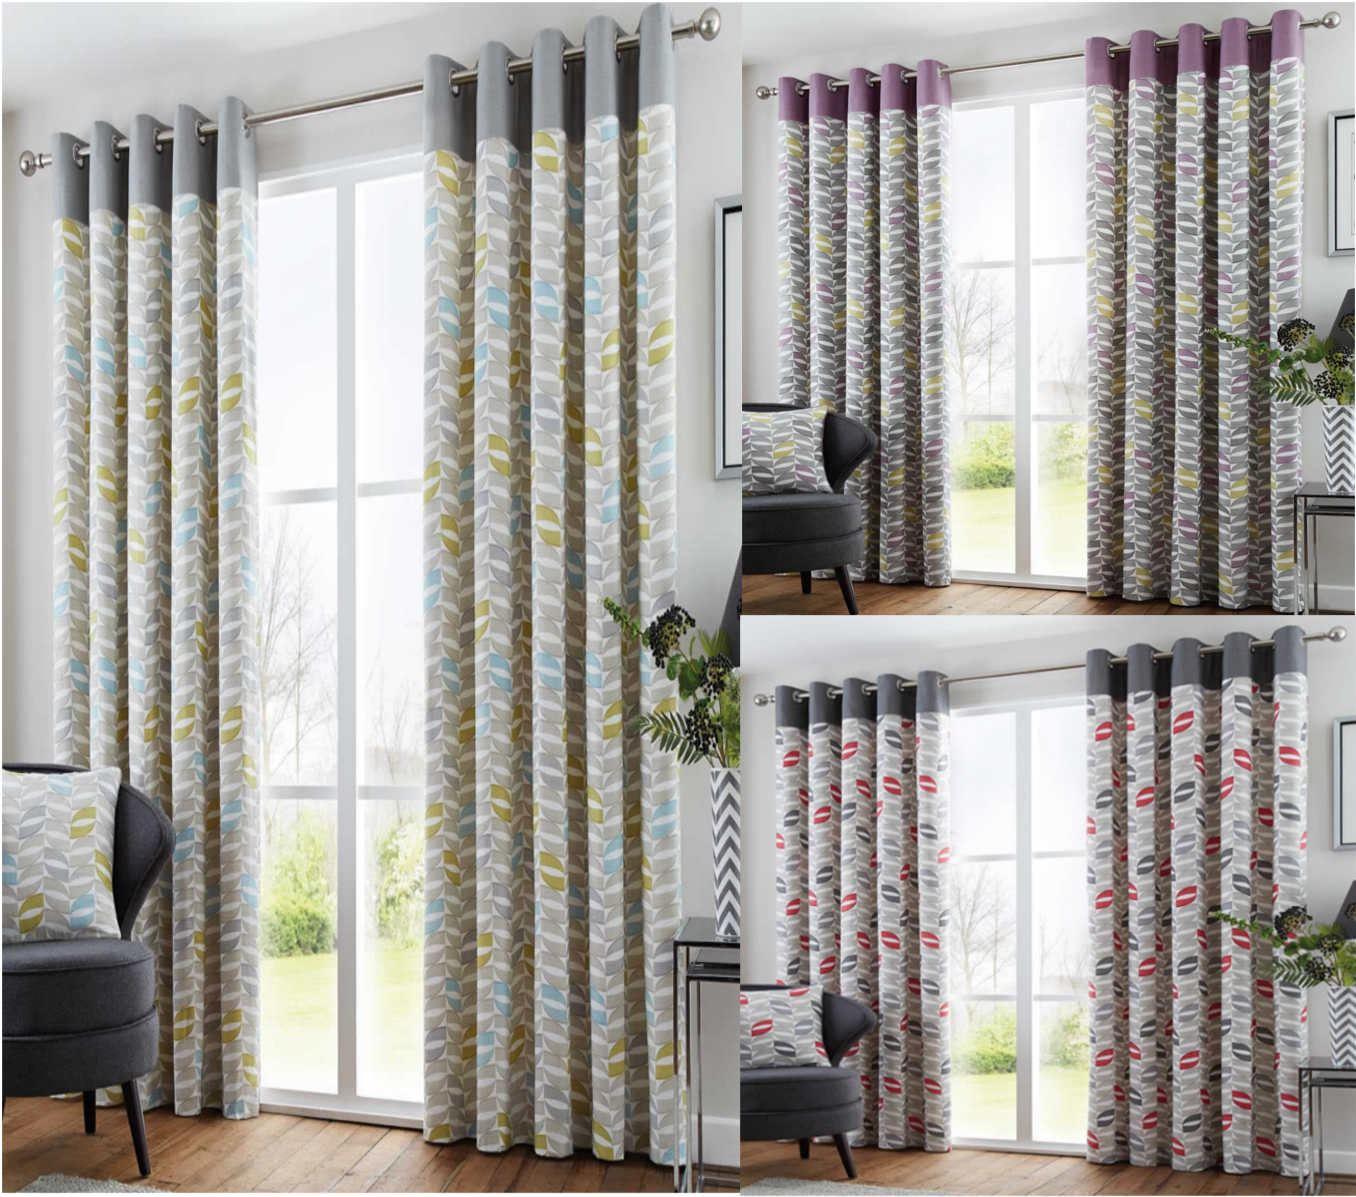 Copeland Geometric Retro Lined Eyelet Curtains Ready Made Ringtop Pairs Ebay